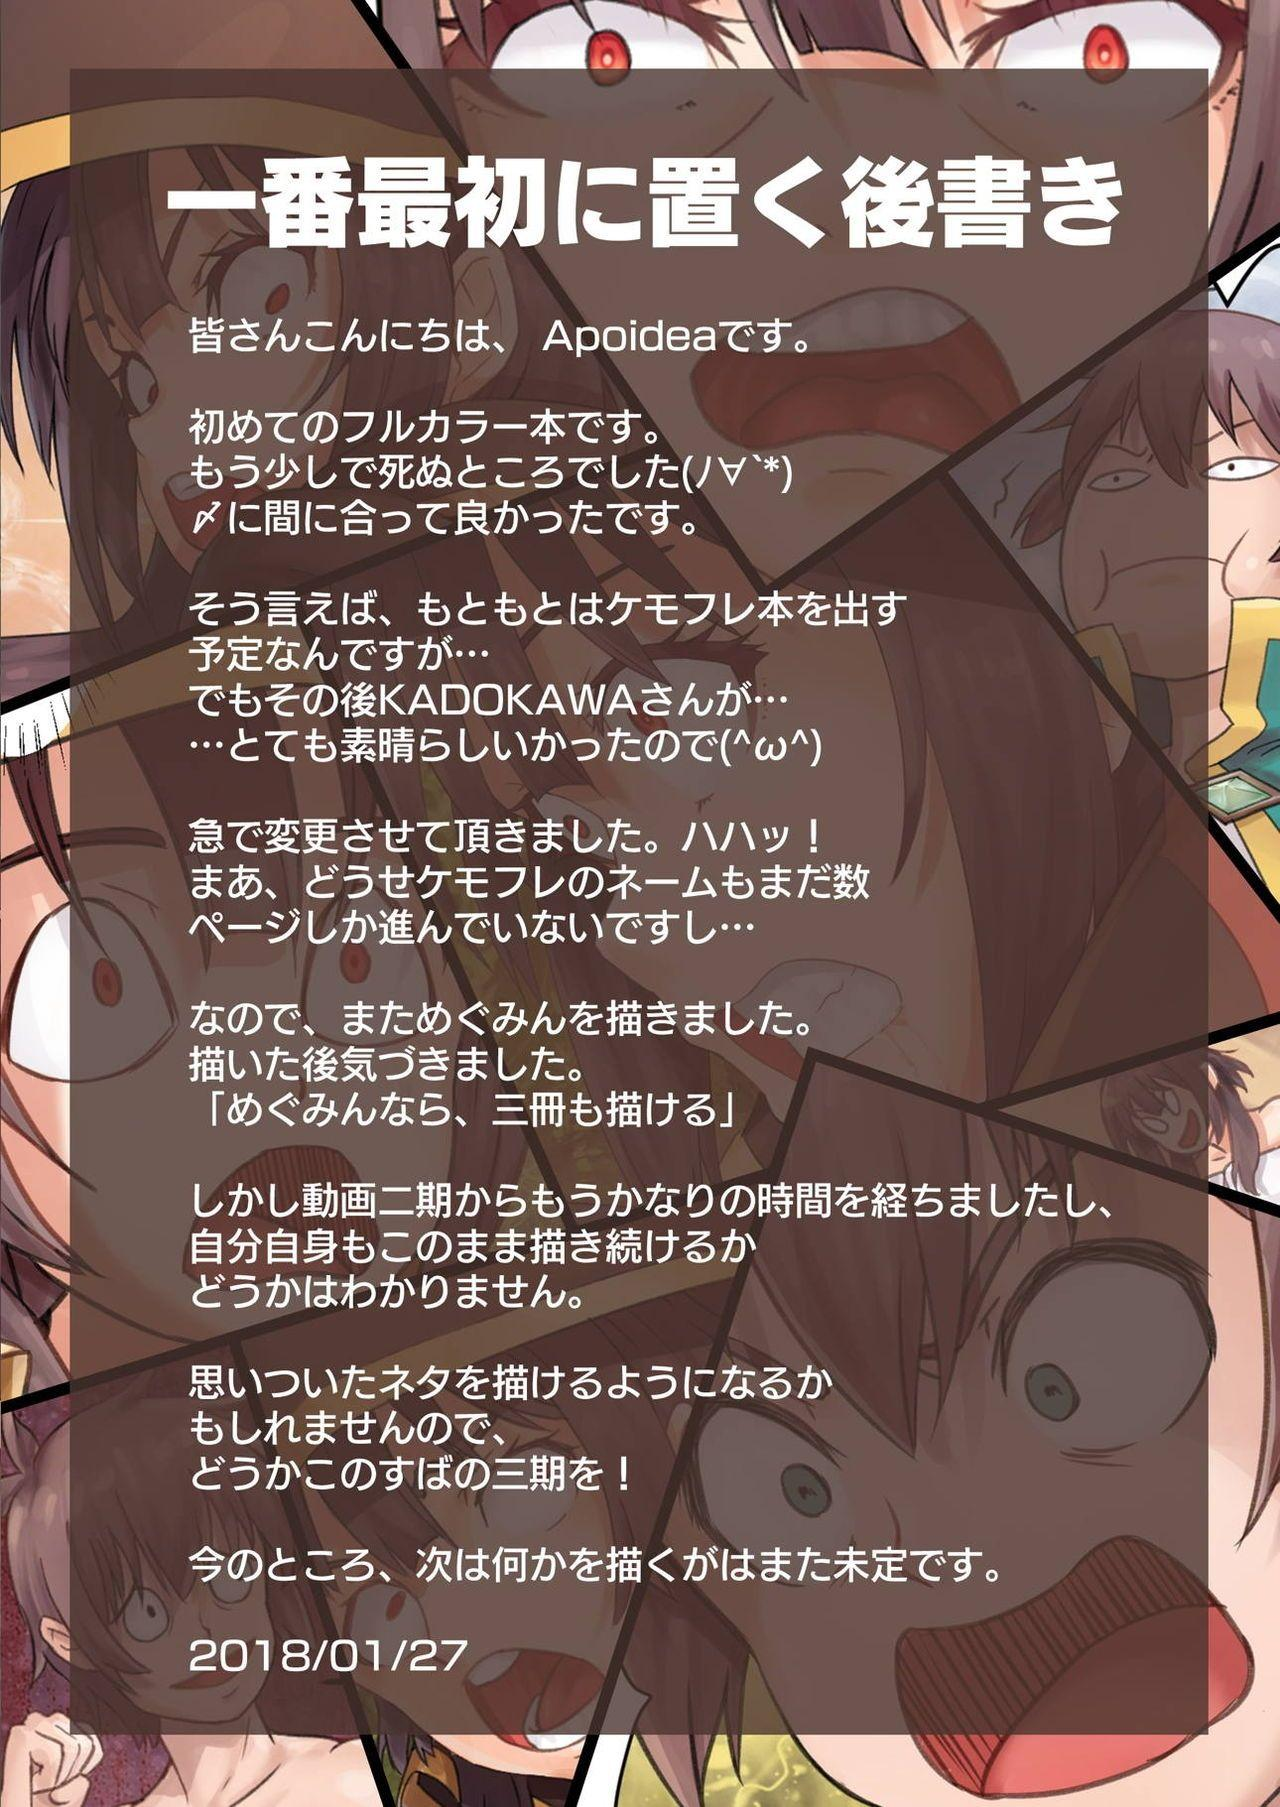 Kono Subarashii Mahoutsukai ni Maryoku Hokyuu o! | My Magical Supplement upon this Wonderful Wizard! 1